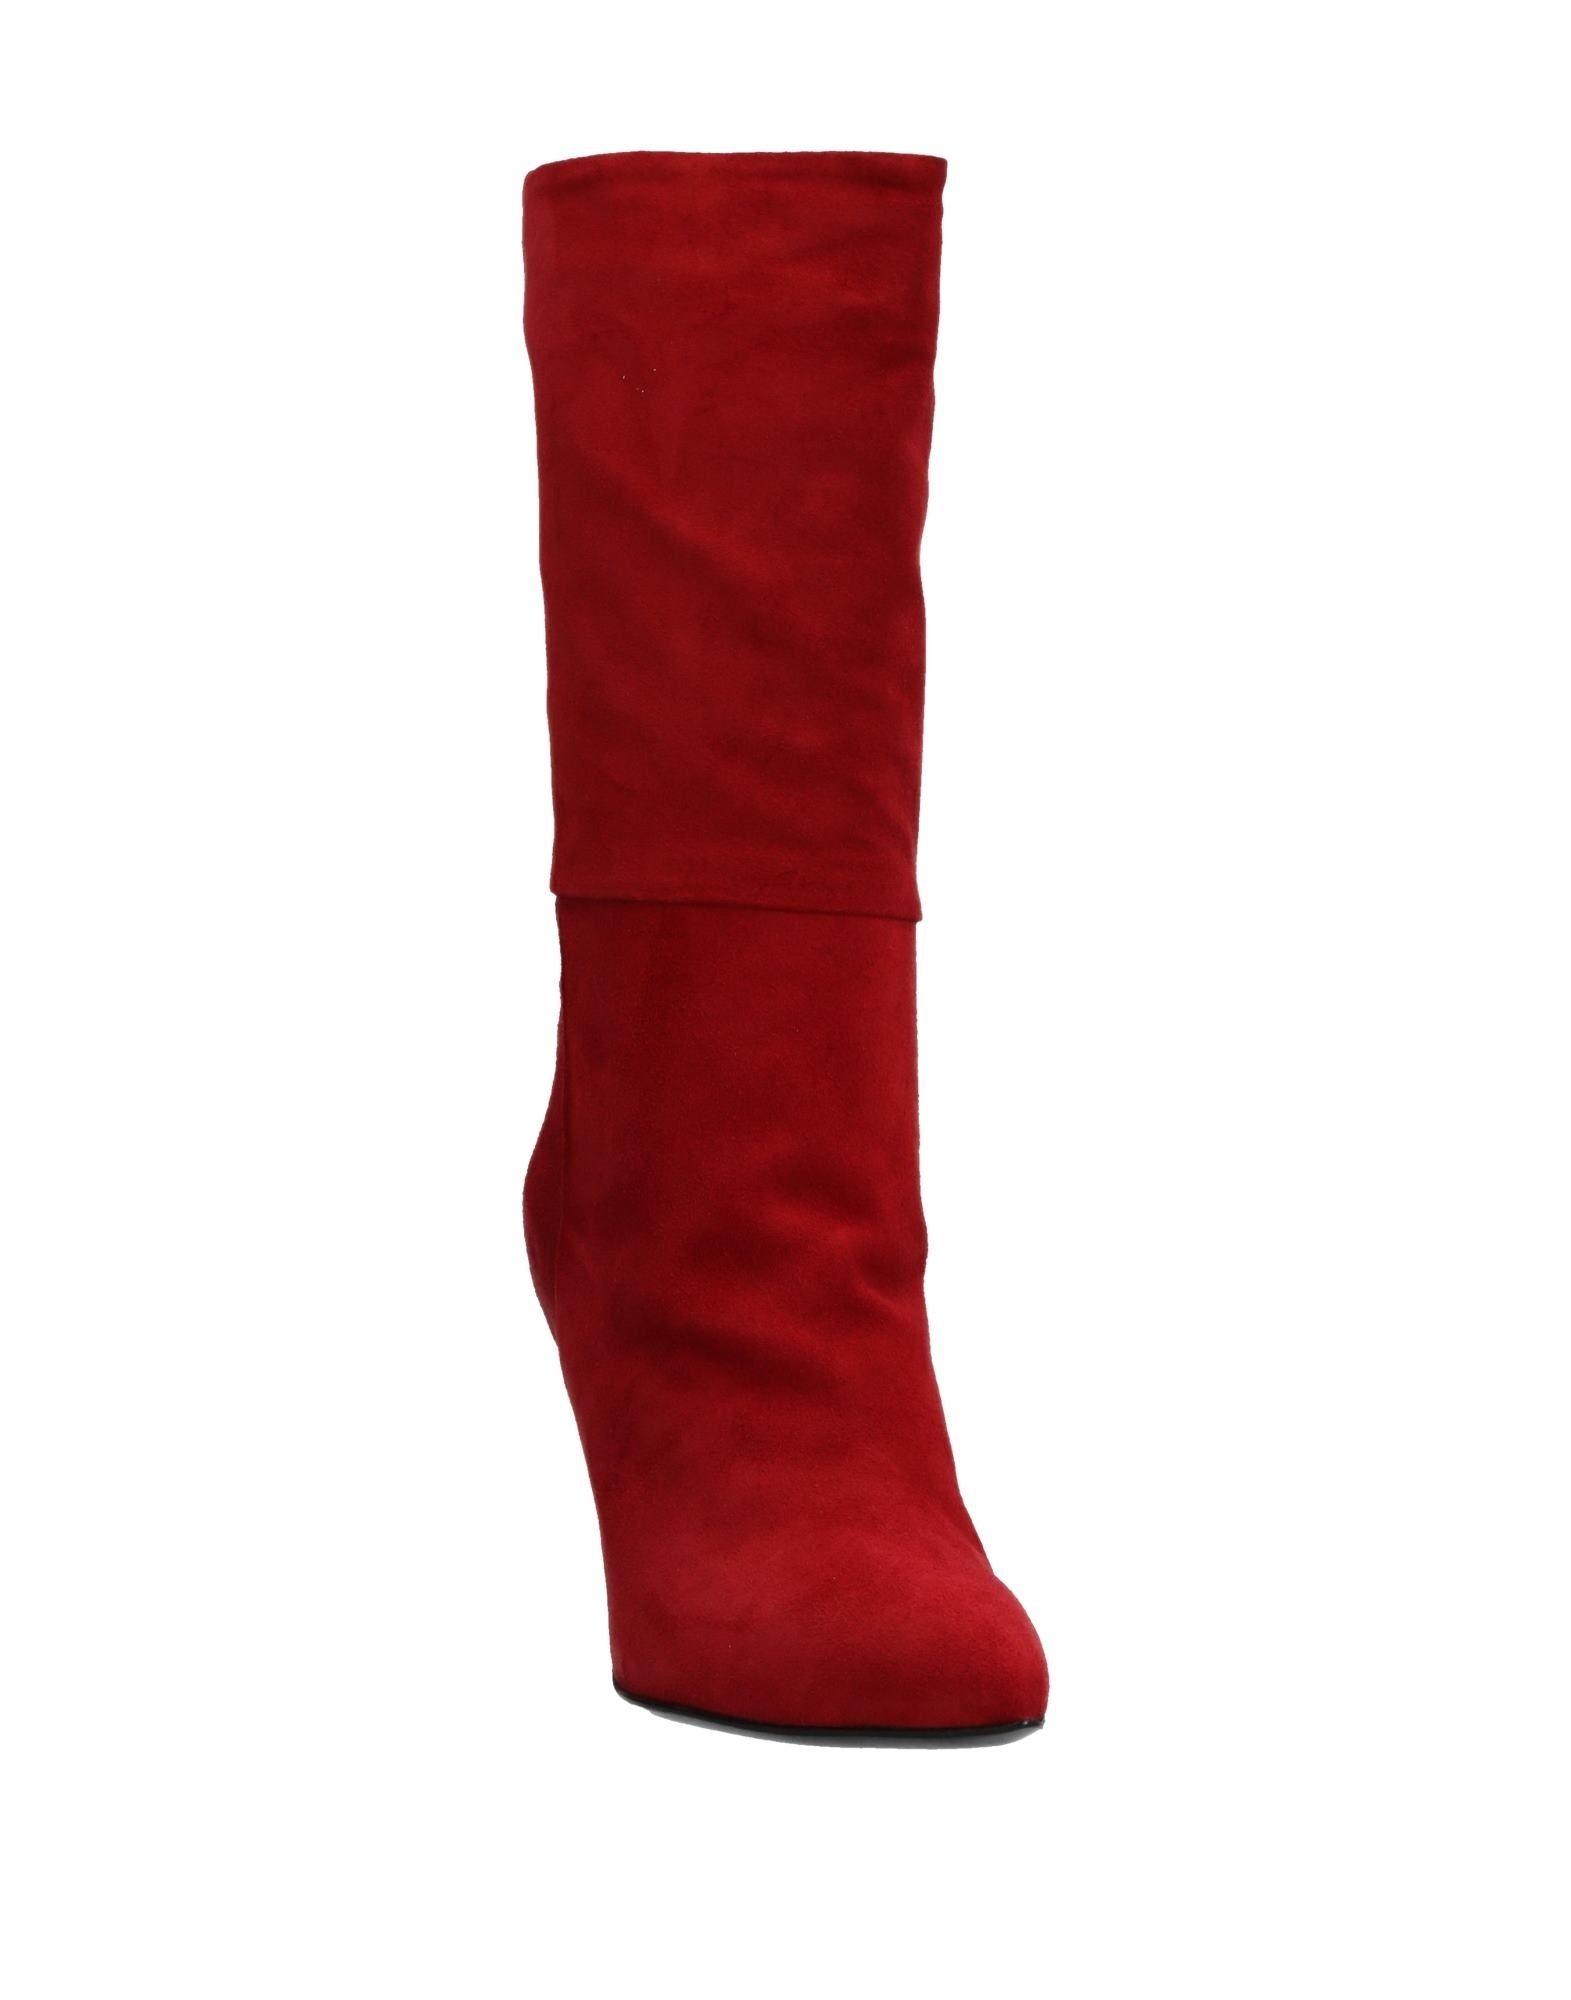 951bc32a8a08 ... Stilvolle Viozzi billige Schuhe Giampaolo Viozzi Stilvolle Stiefel  Damen 11532991SL 2c5f21 ...